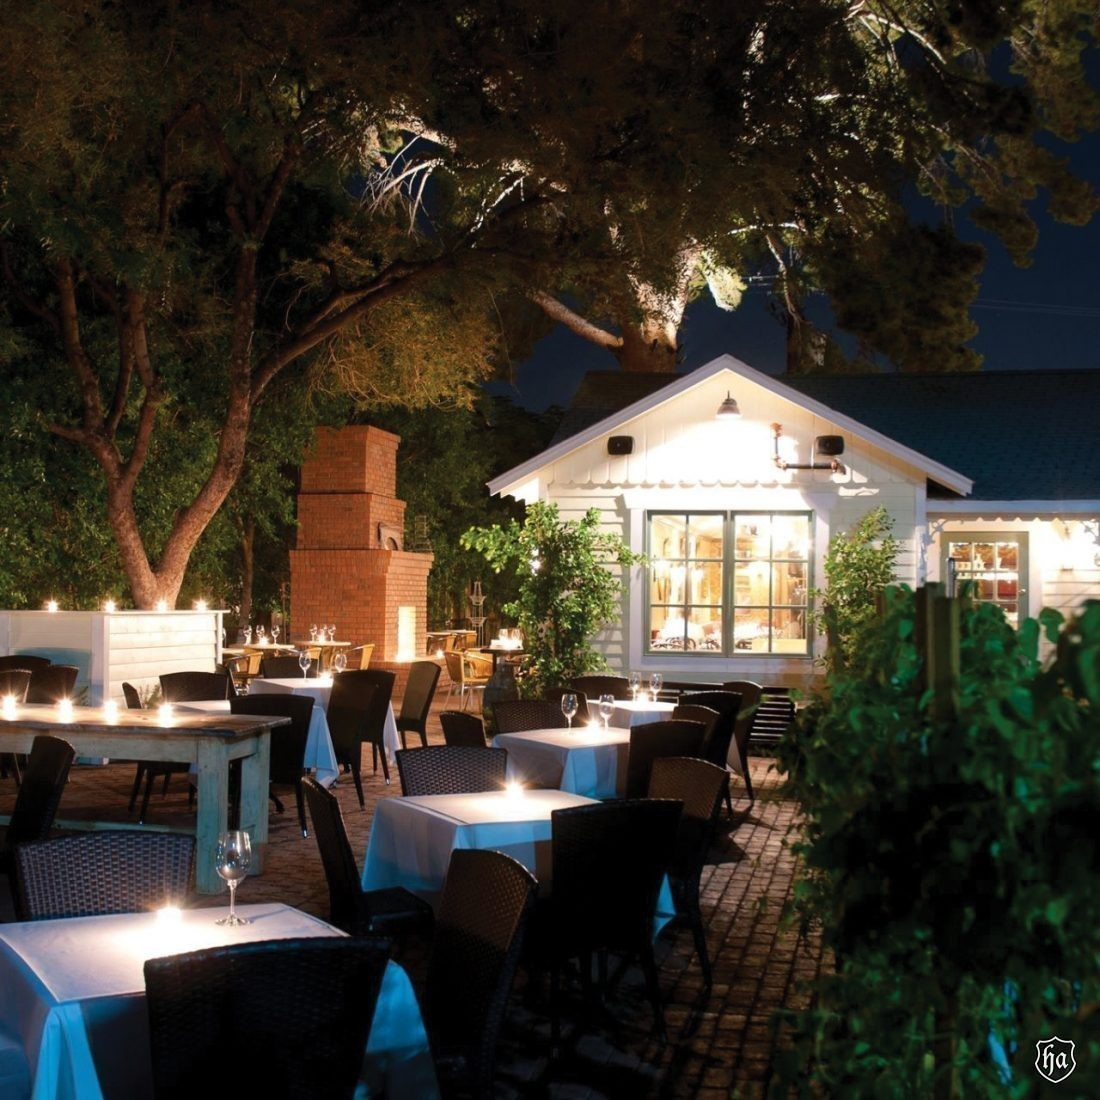 The_House_Brasserie_in_Scottsdale_3